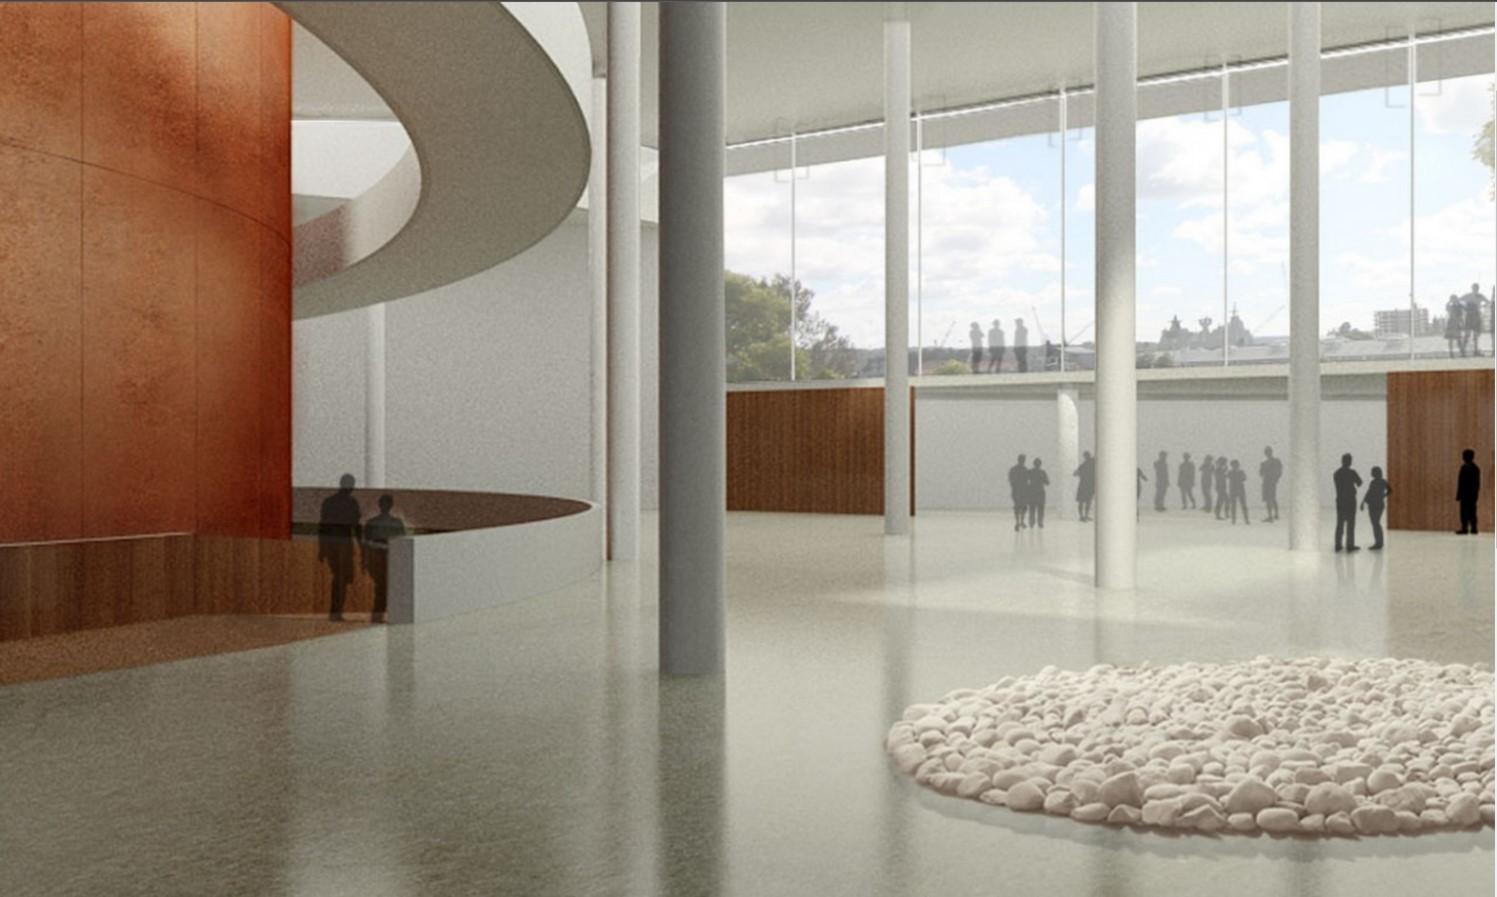 Sydney Modern Project by Rahul Mehrotra: Fabric for Art - Sheet5